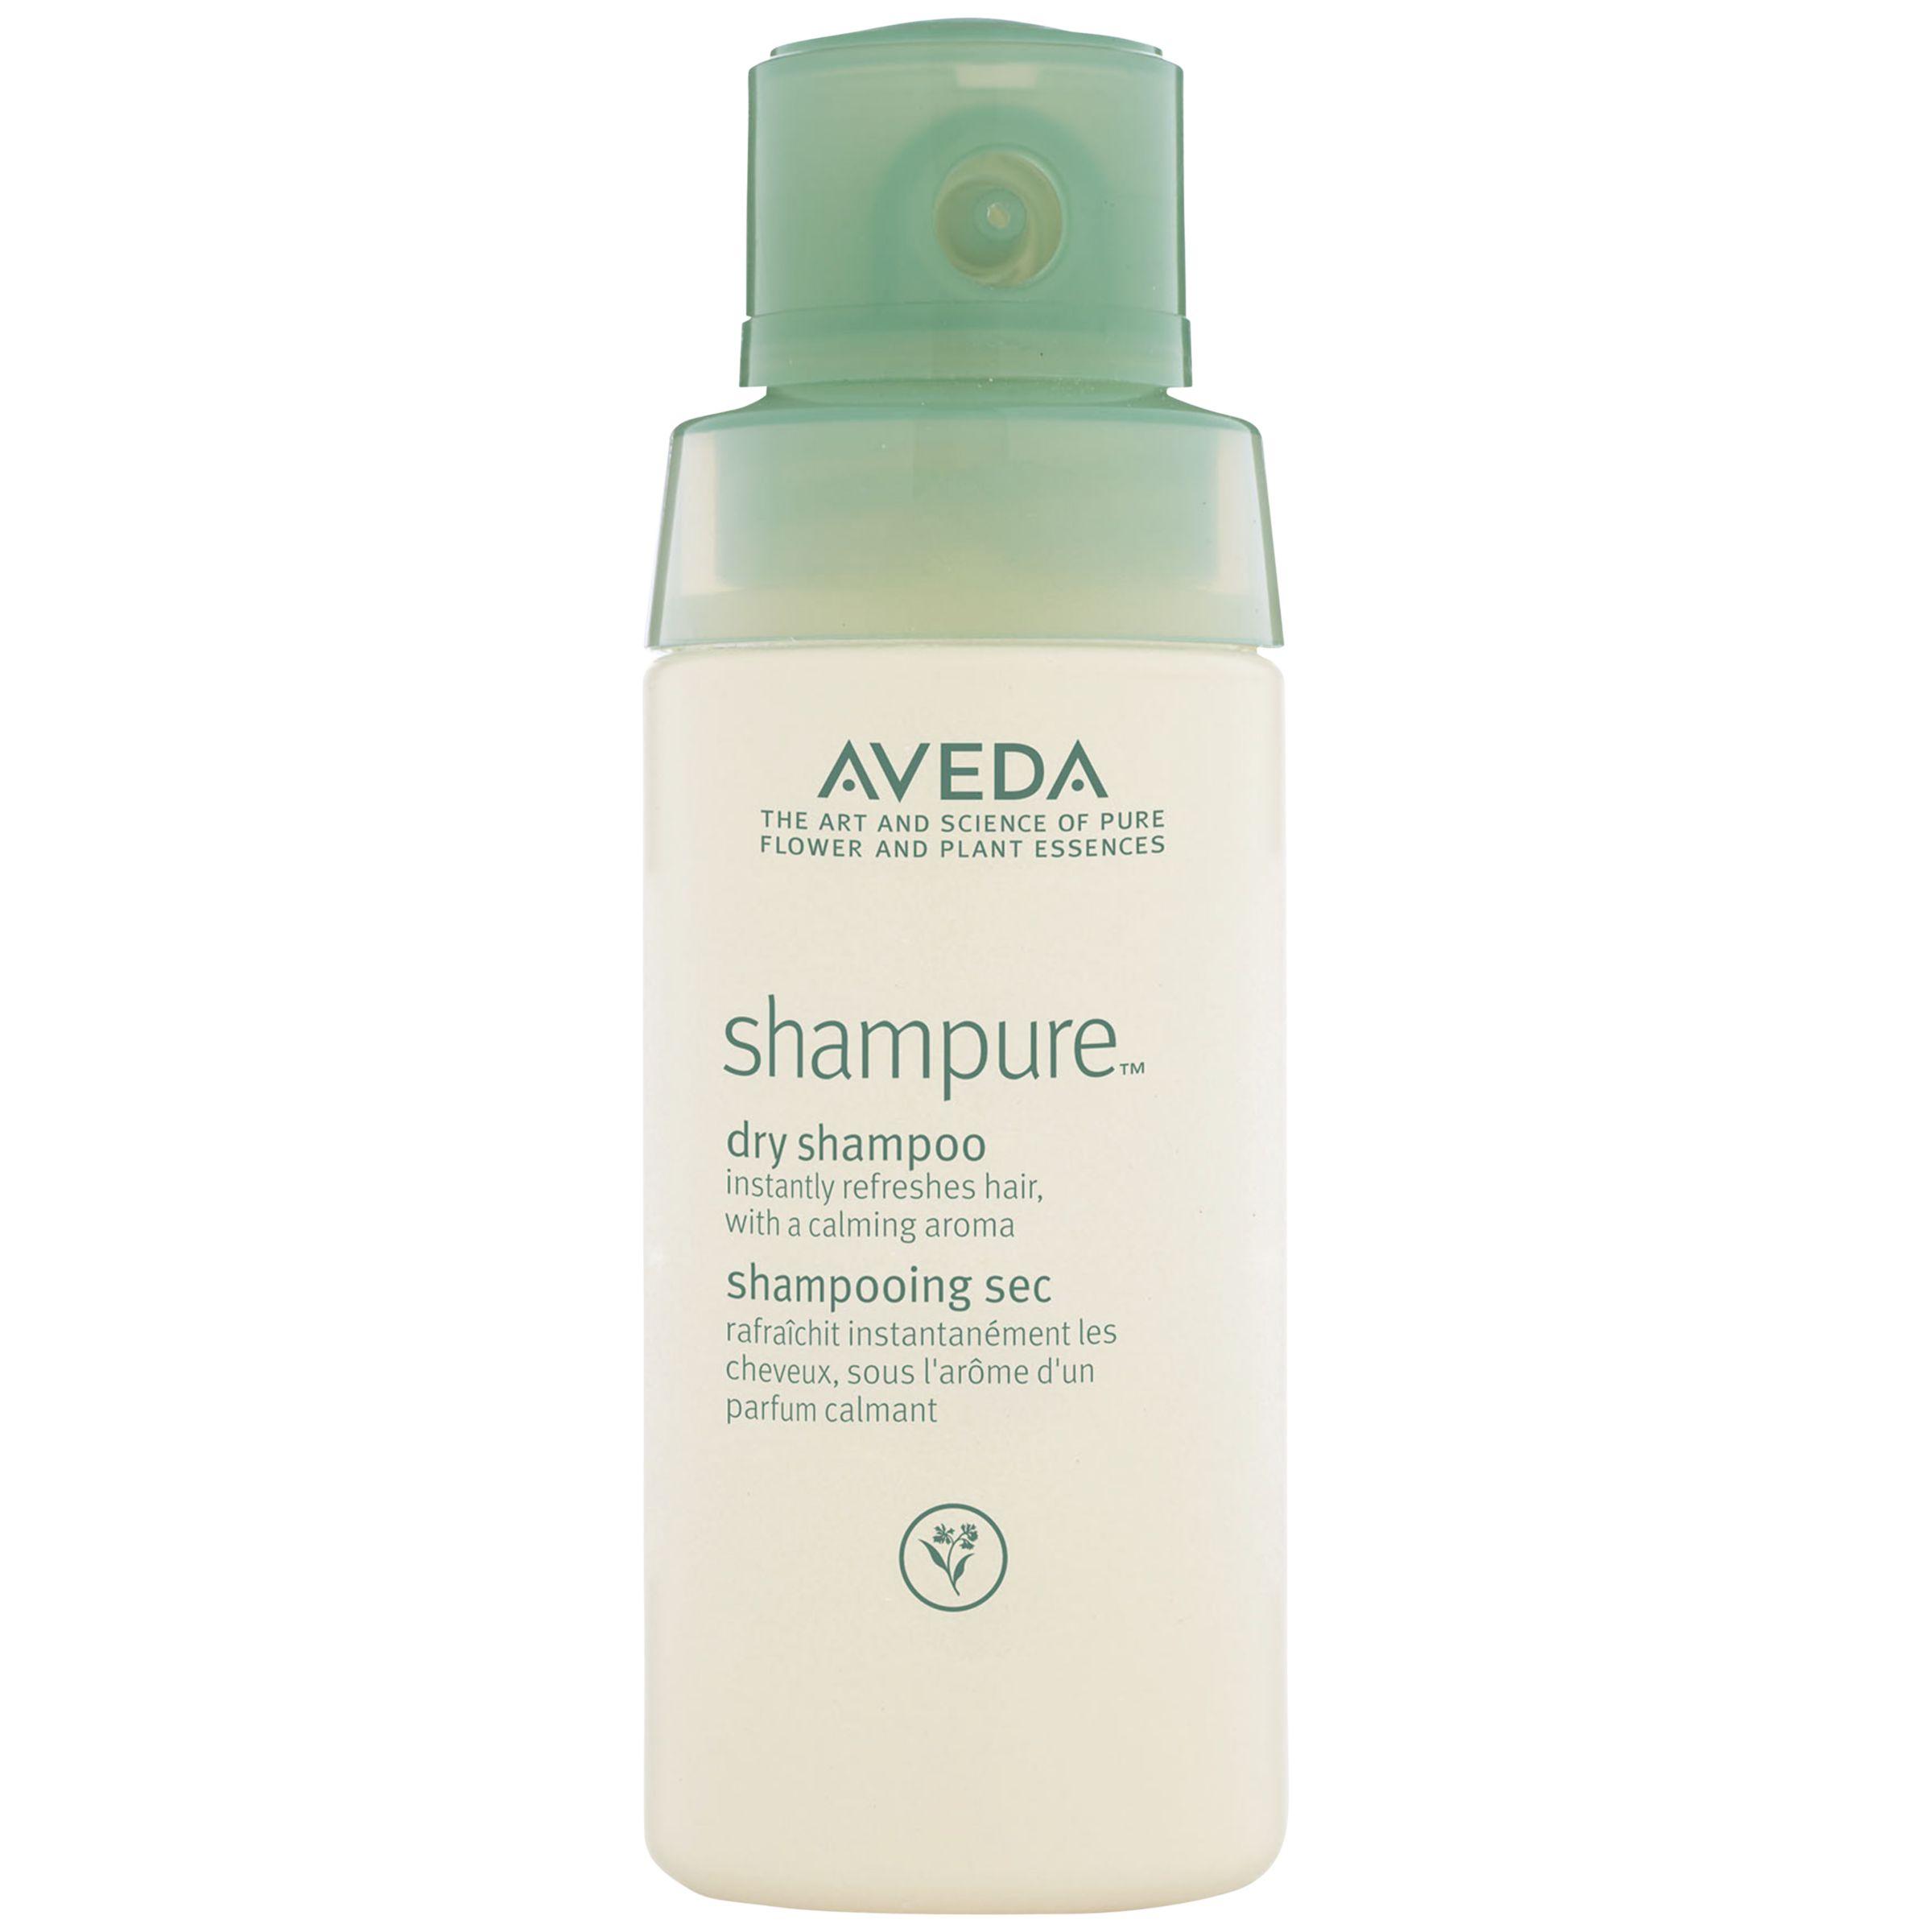 AVEDA AVEDA Shampure Dry Shampoo, 60ml